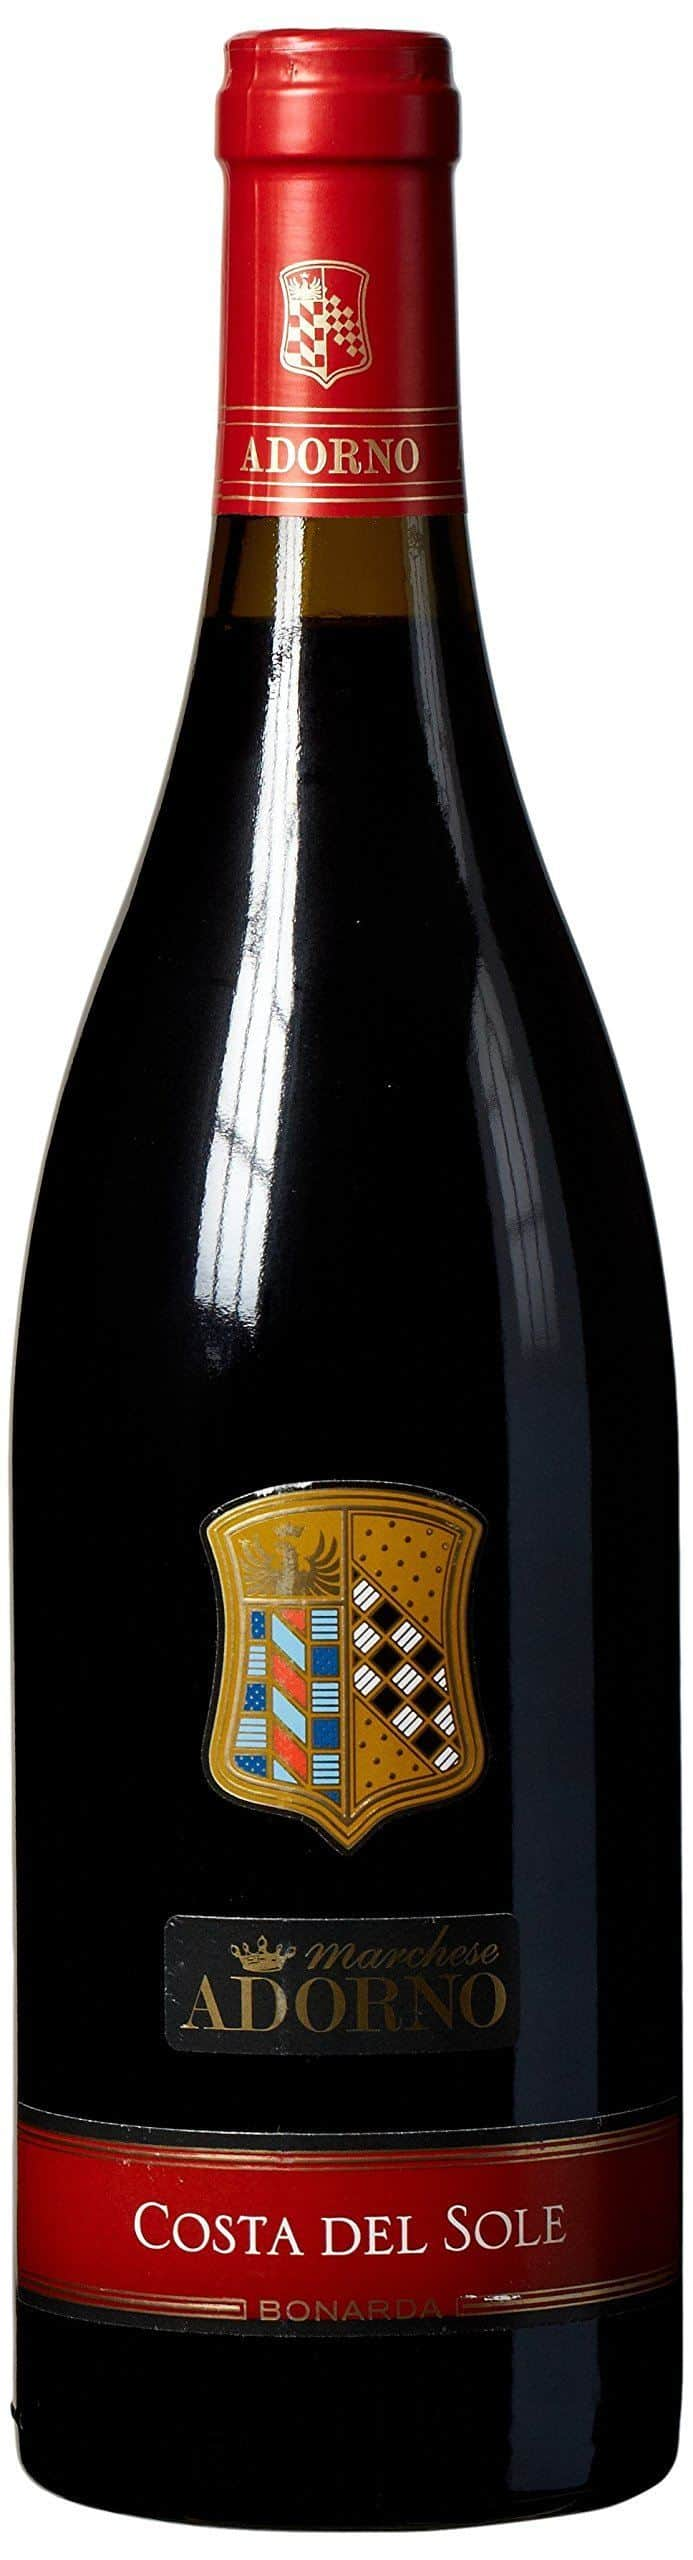 2012 Marchese Adorno Bonarda Lombardy Wine